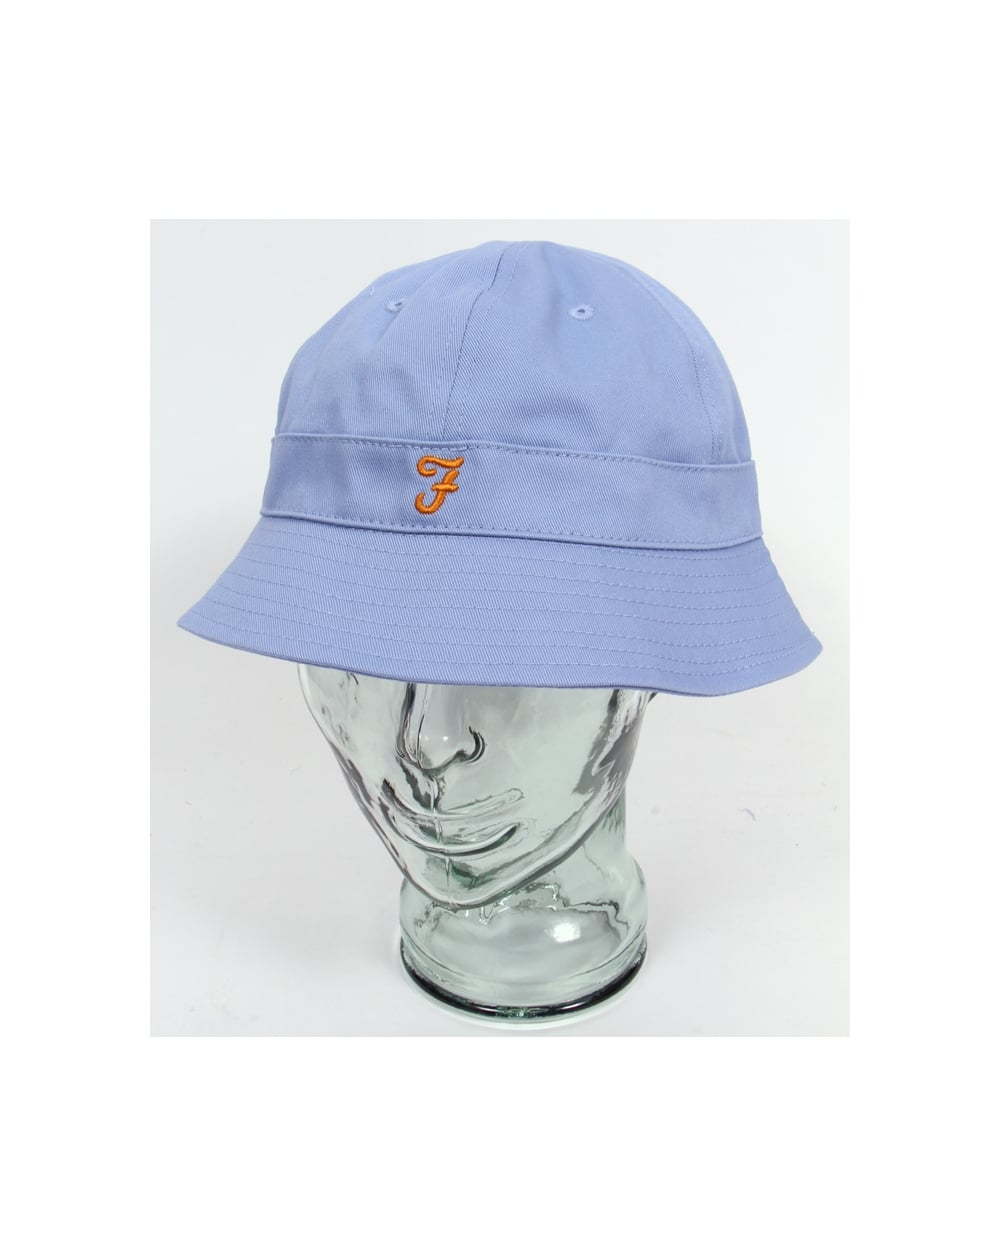 Farah Farah Bucket Hat Polar Blue bc687015a8a